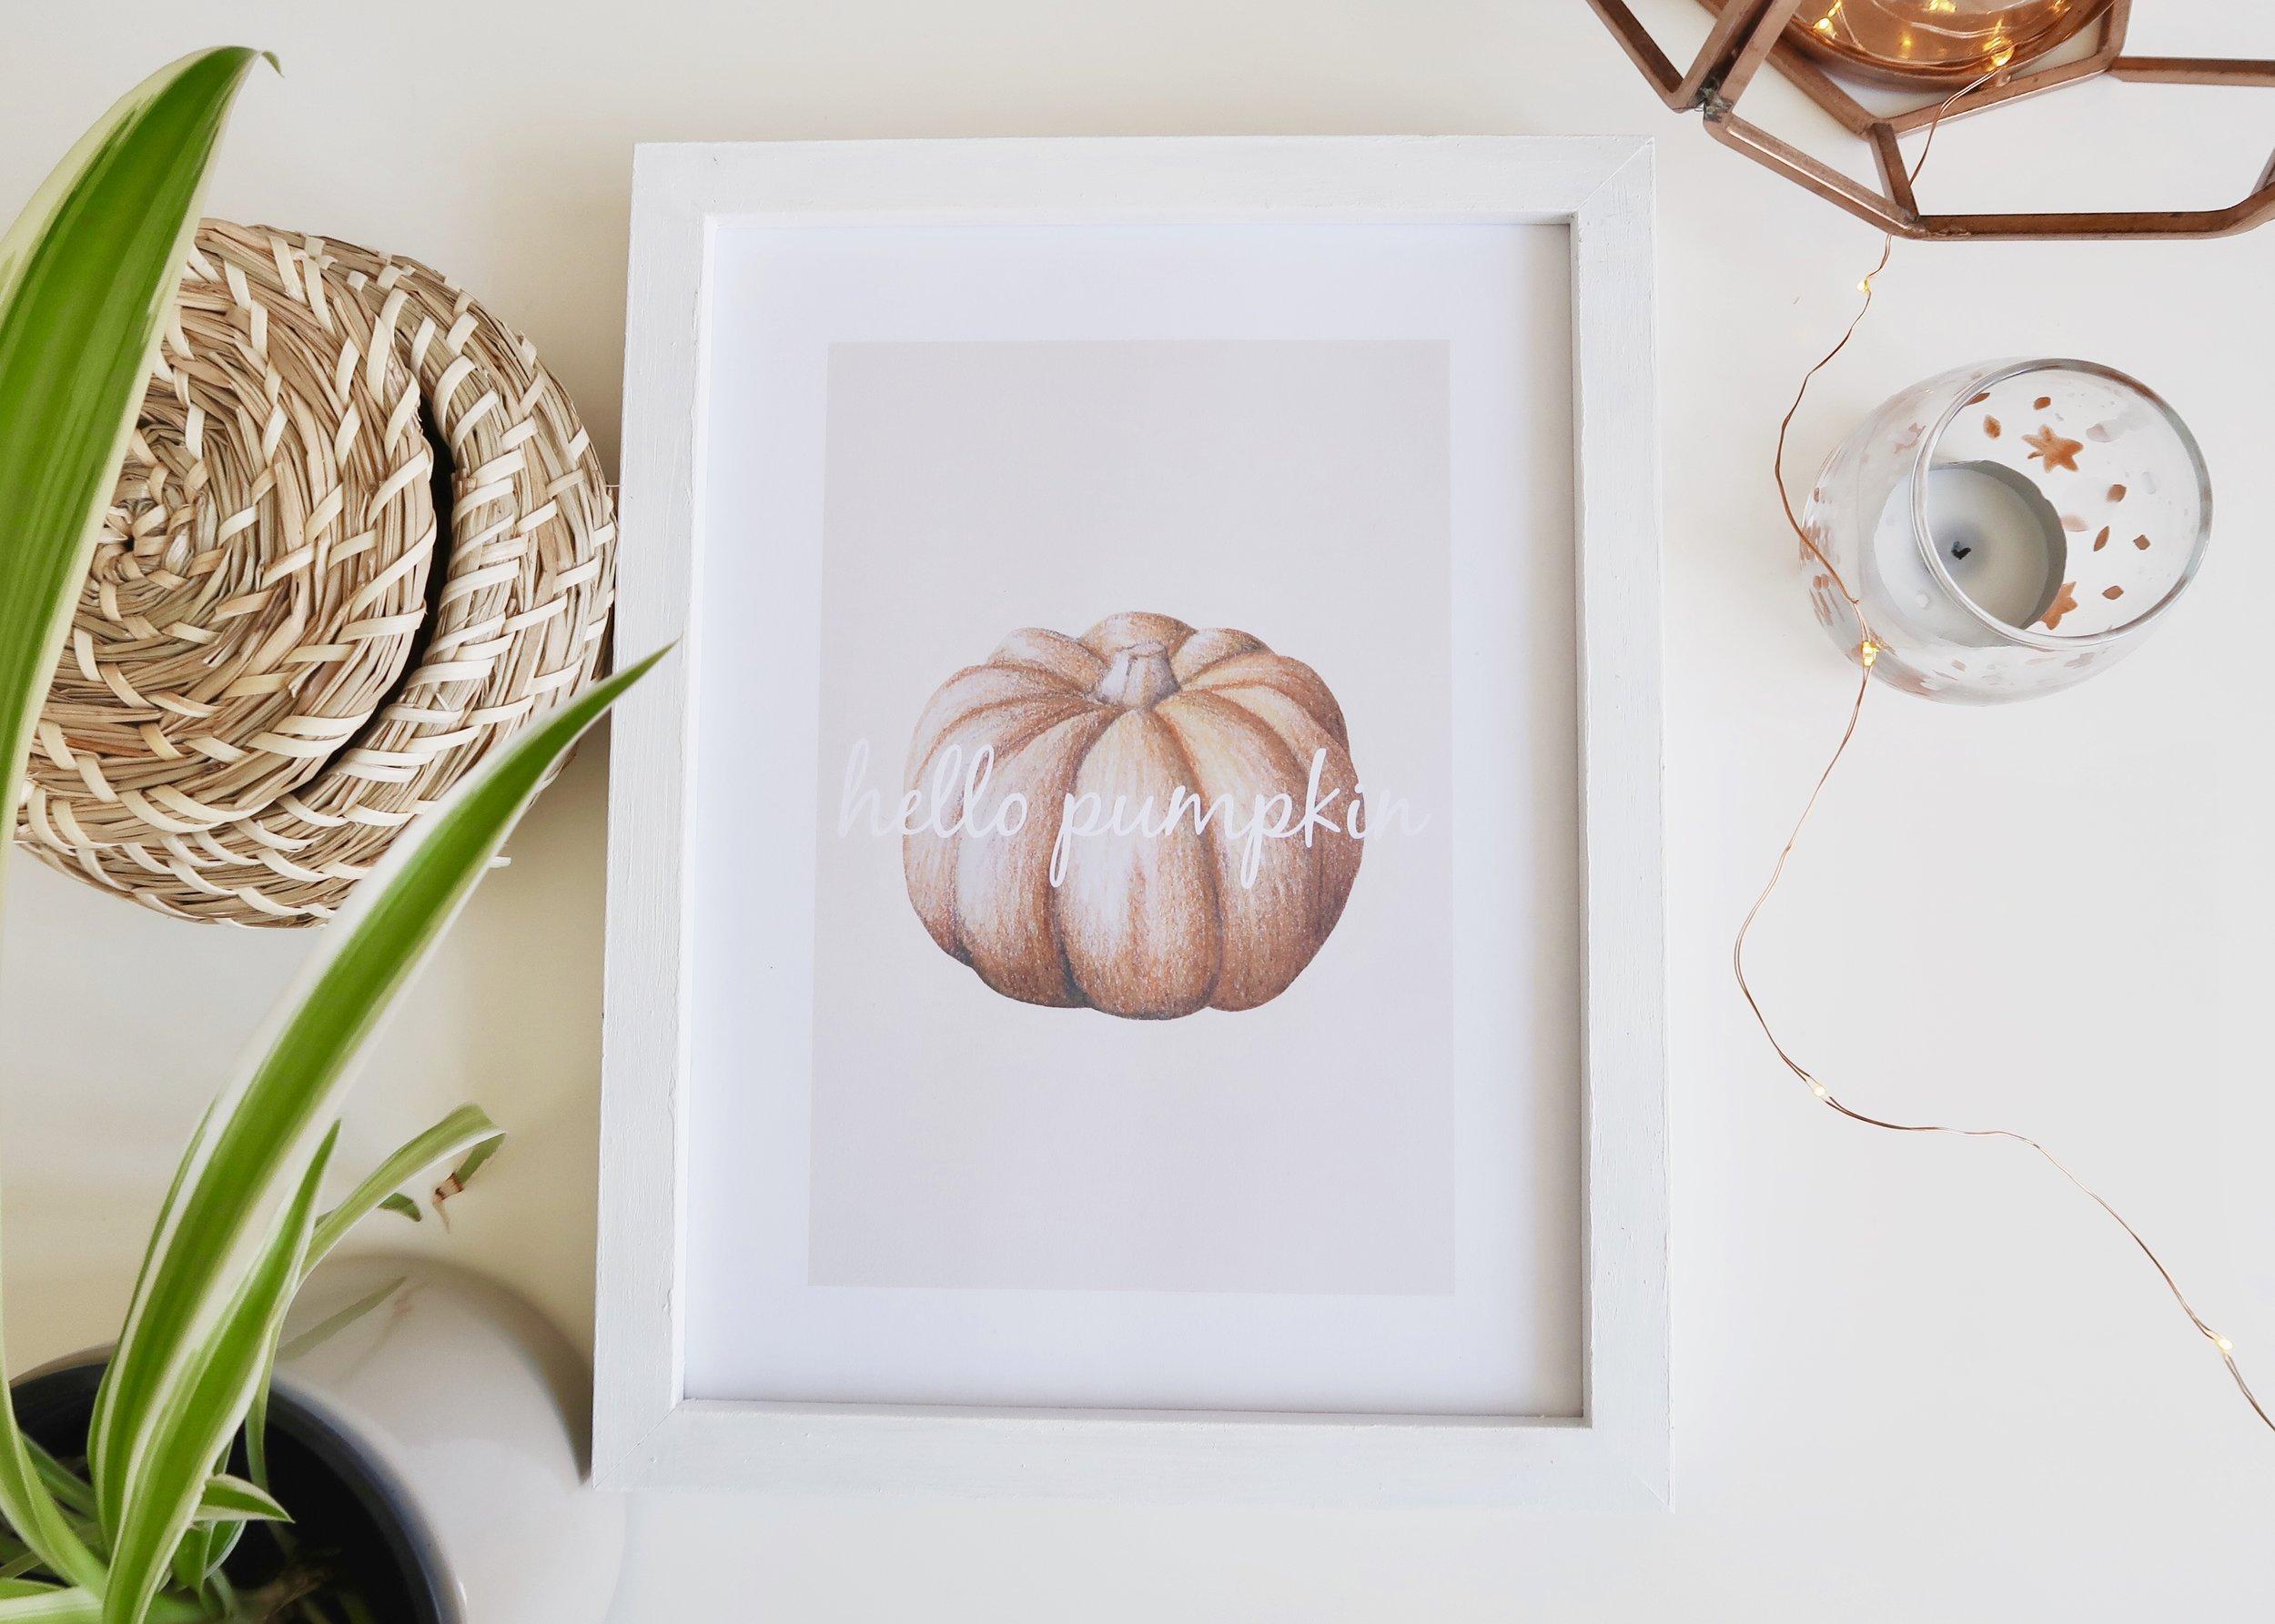 DIY Printable Pumpkin Wall Art by Isoscella